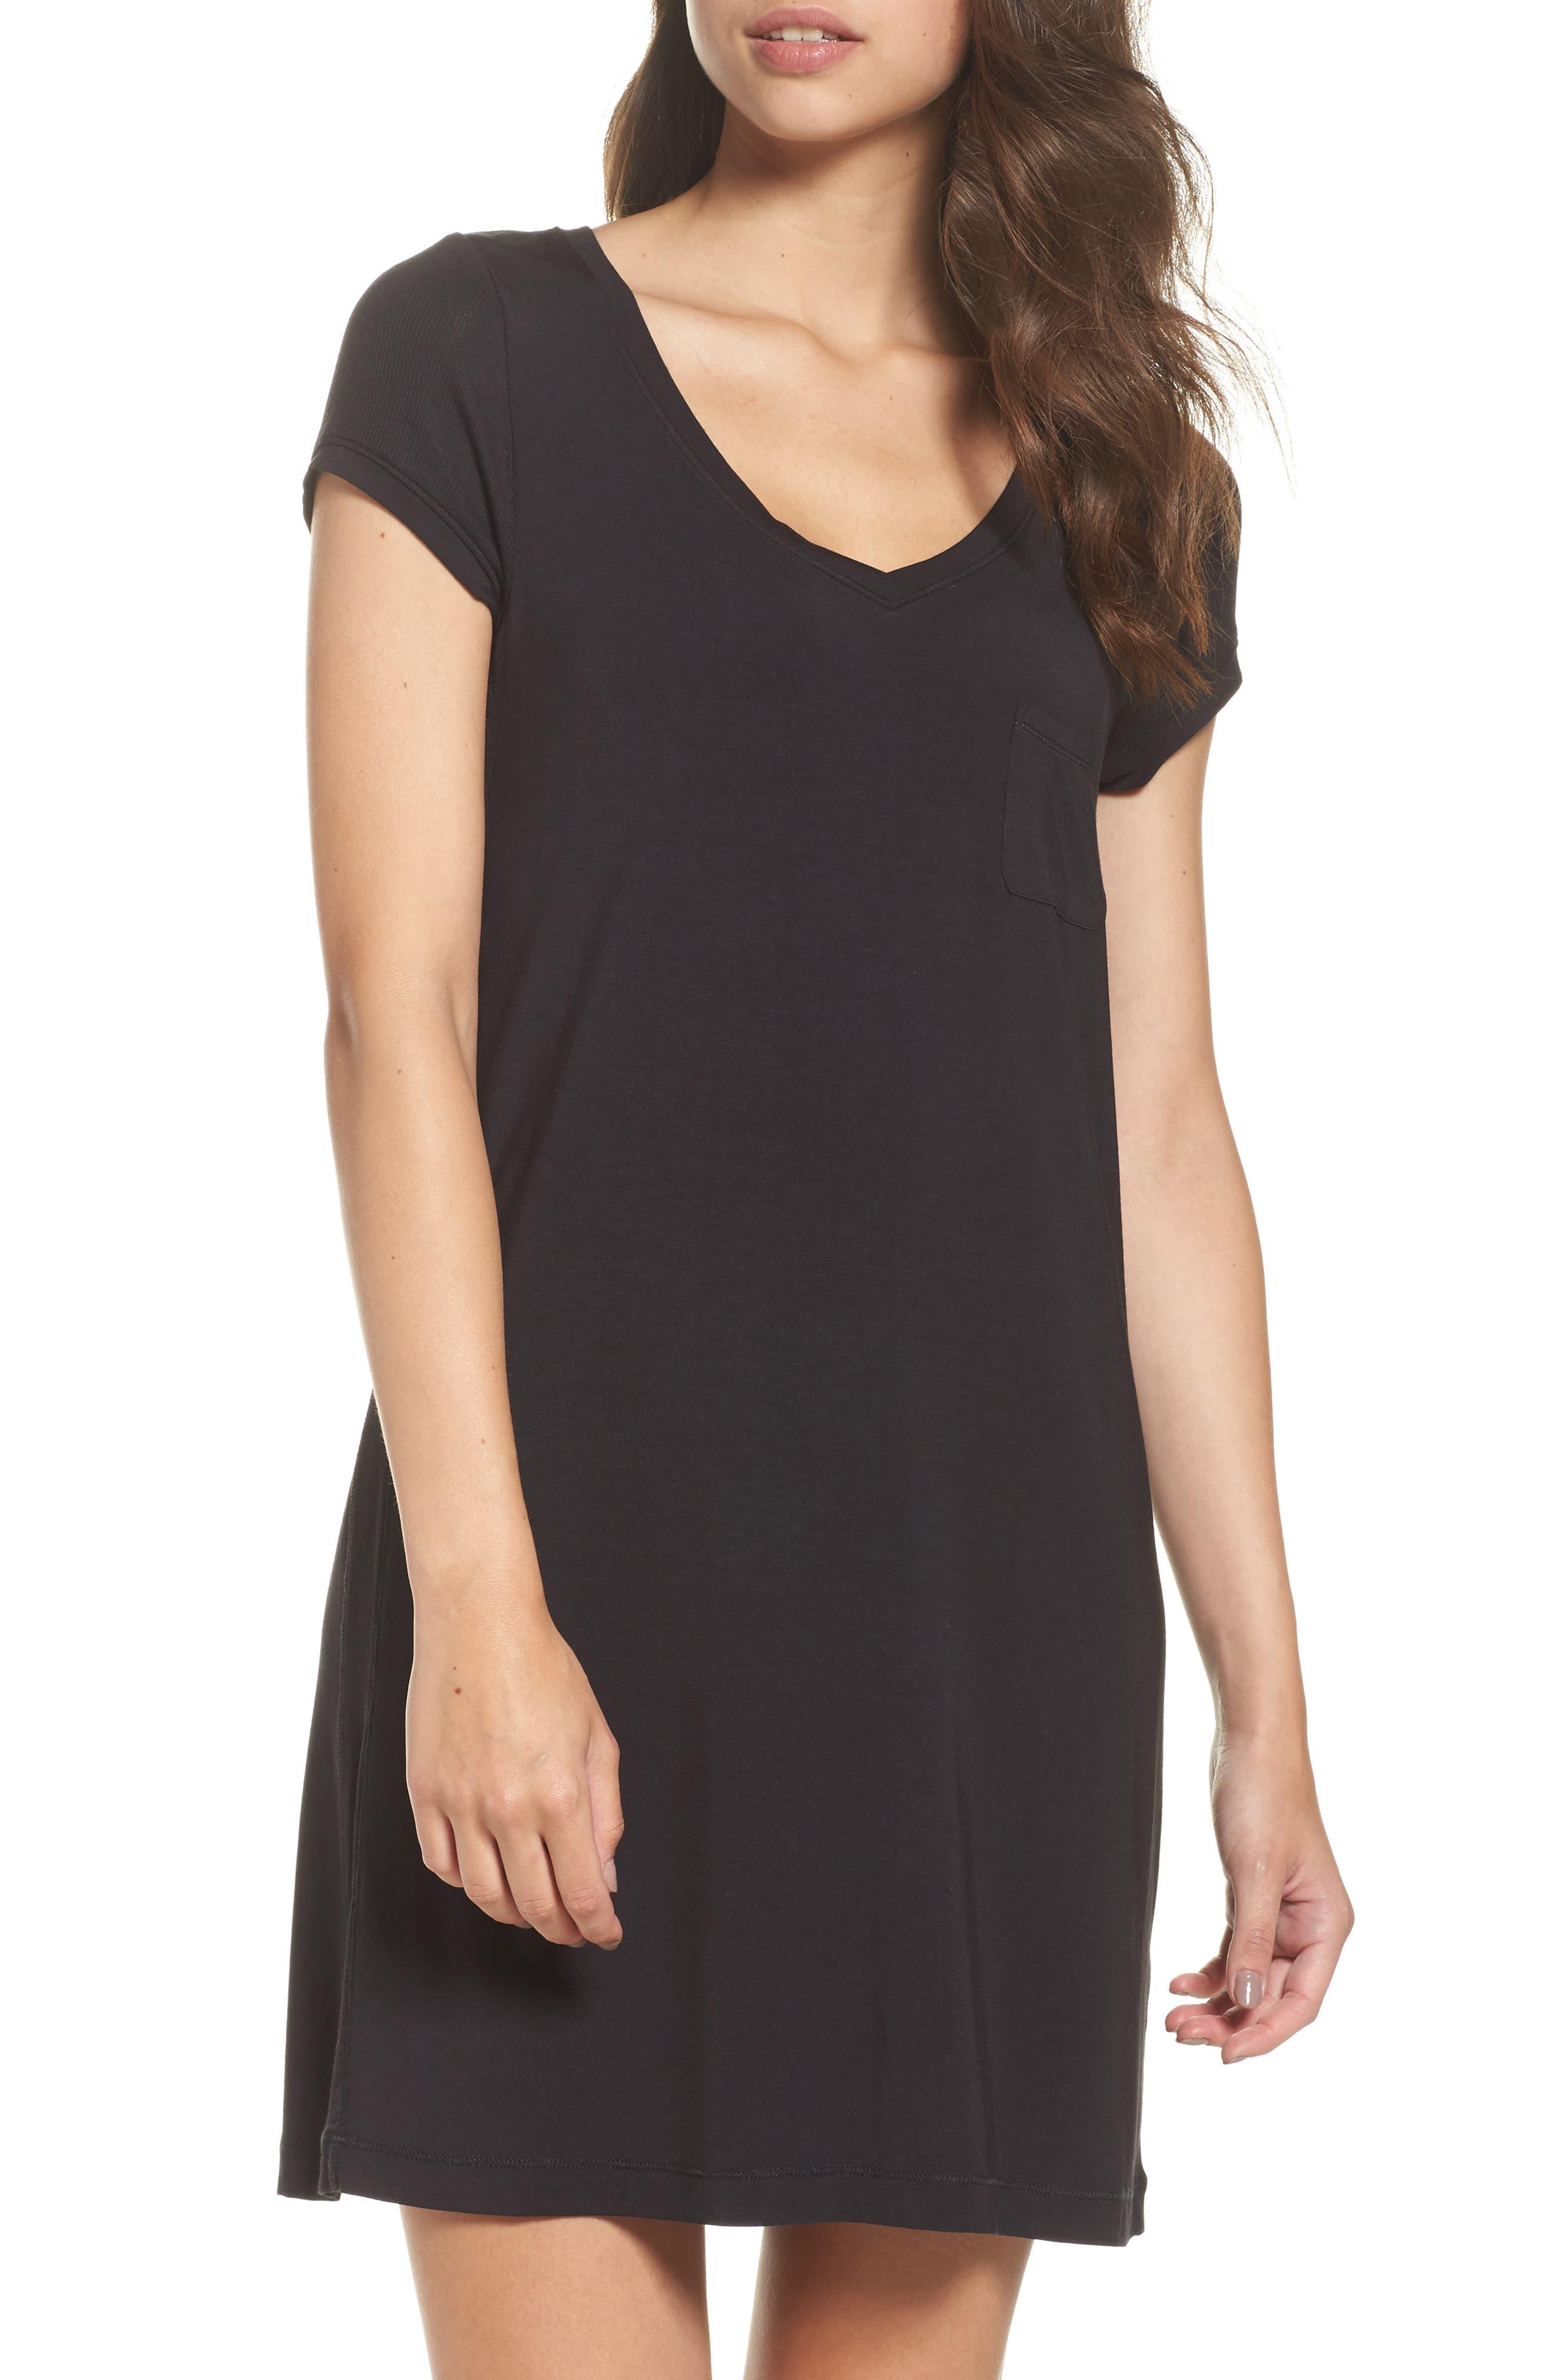 Alternate Image 1 Selected - DKNY 'City Essentials' V-Neck Sleep Shirt